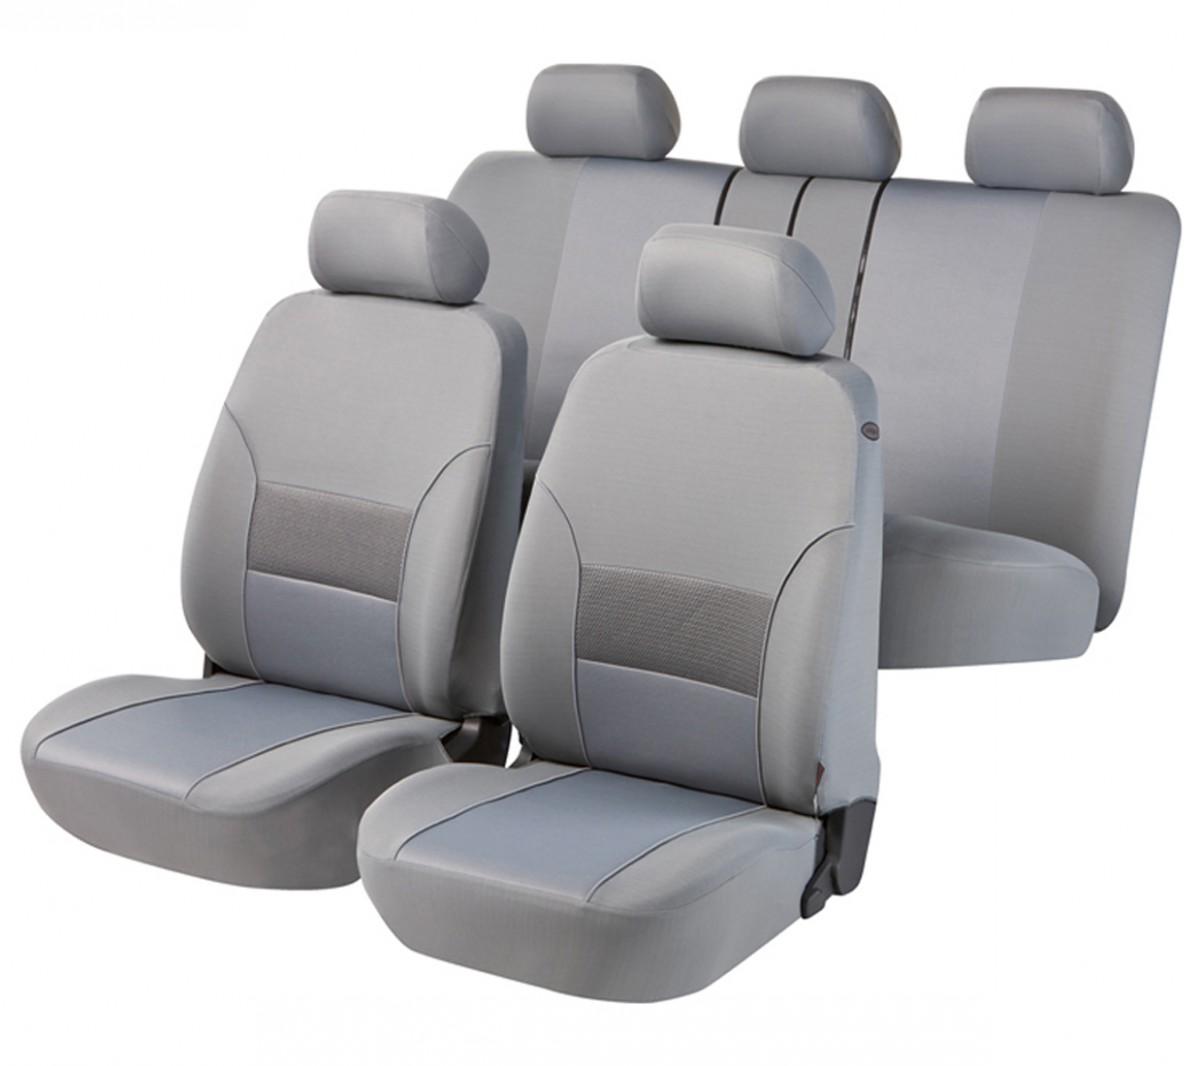 autositzbezug schonbezug komplett set vw caddy grau. Black Bedroom Furniture Sets. Home Design Ideas